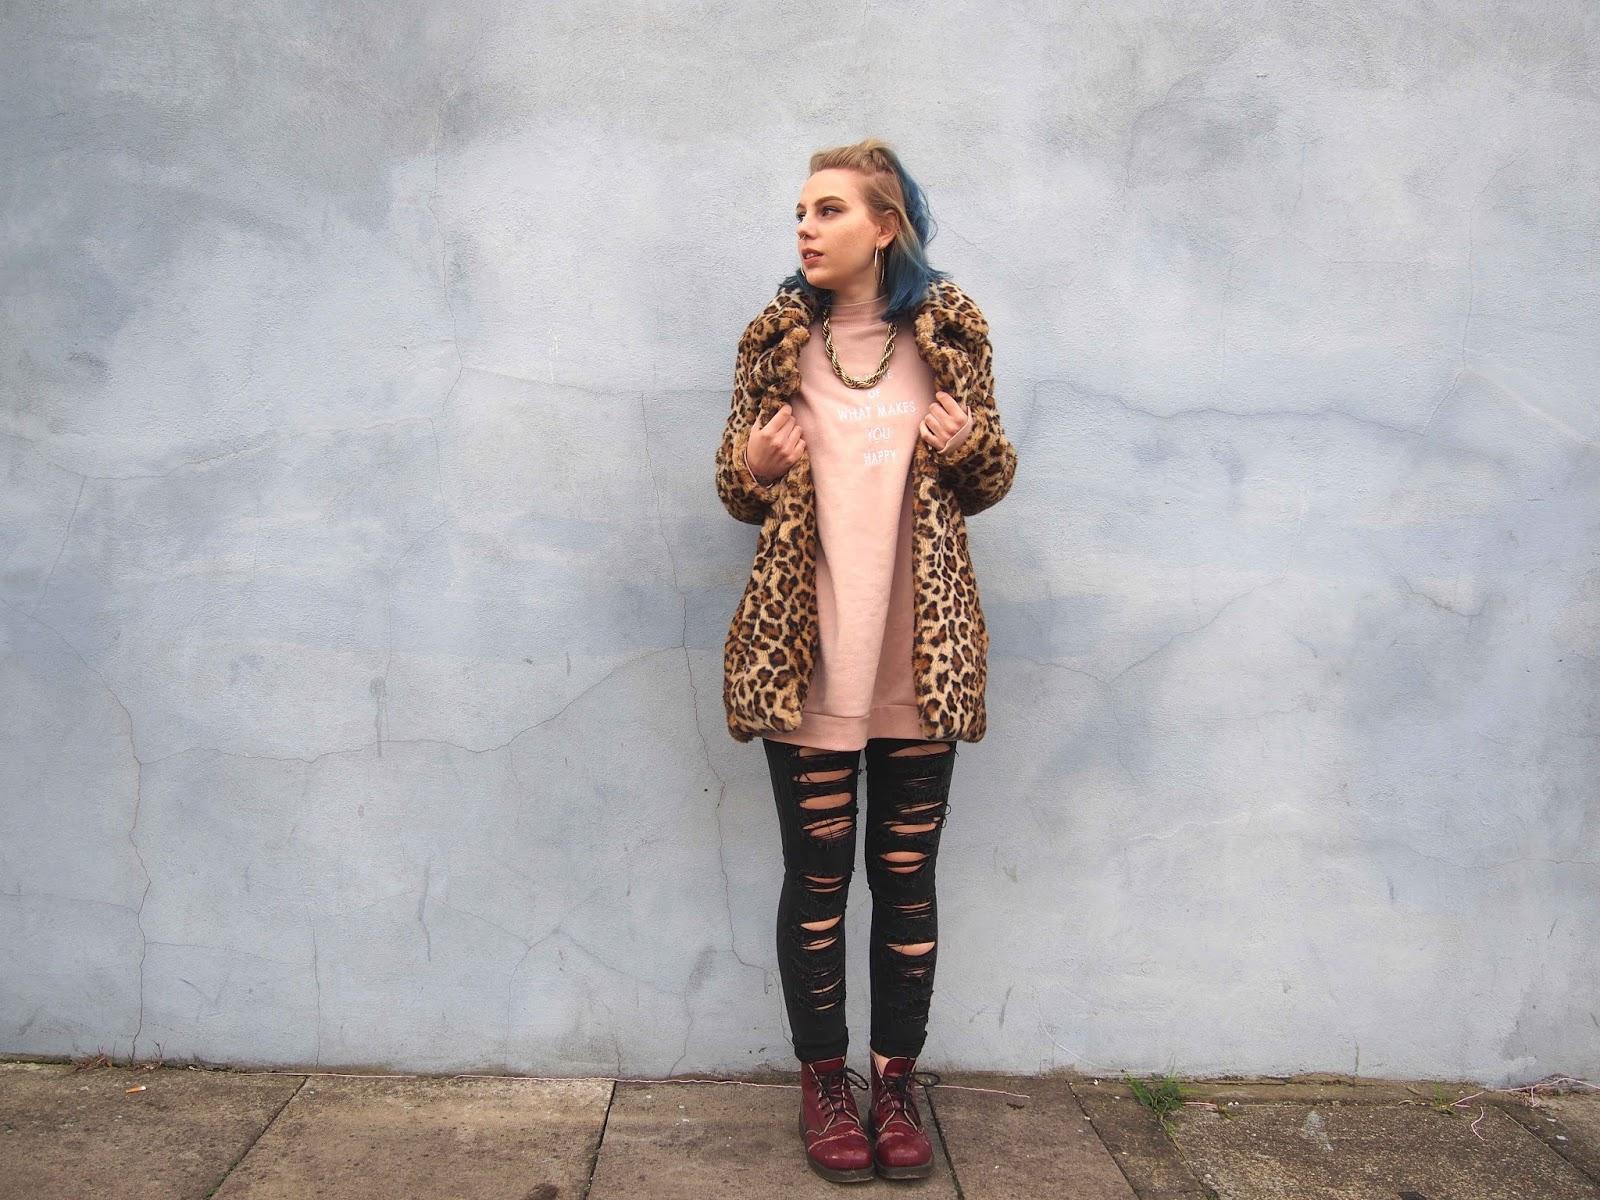 ripped jeans, black ripped skinny jeans, womens ripped skinny jeans, winter outfit ideas, winter outfits, grunge outfits, doc martens, doc martens boots, leopard print coat, leopard faux fur coat